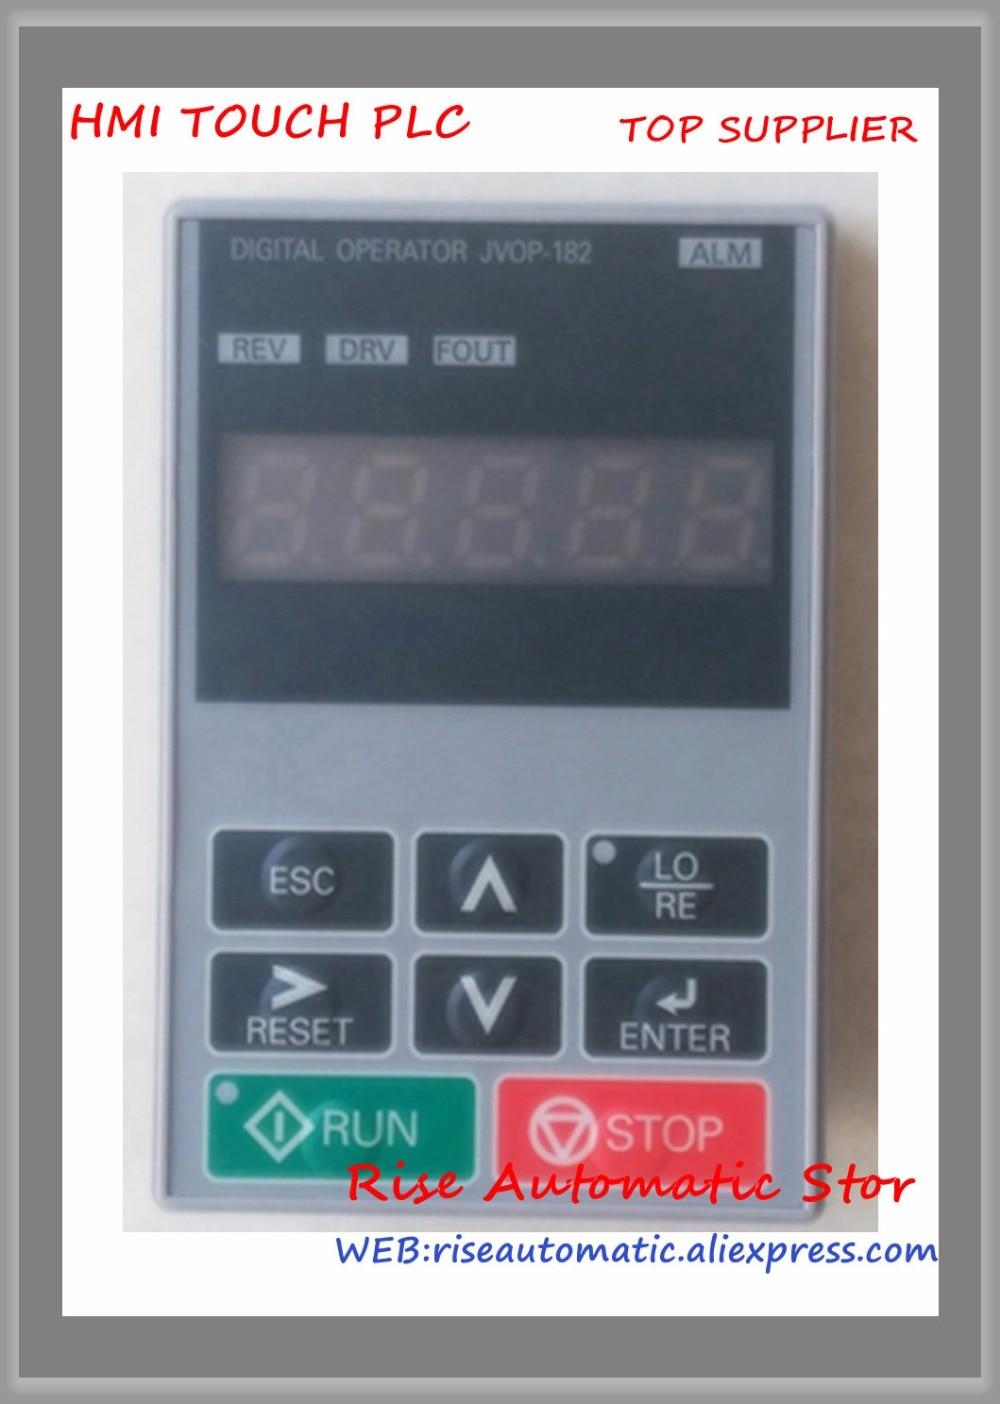 New Original Operator Panel JVOP-182 High-qualityNew Original Operator Panel JVOP-182 High-quality